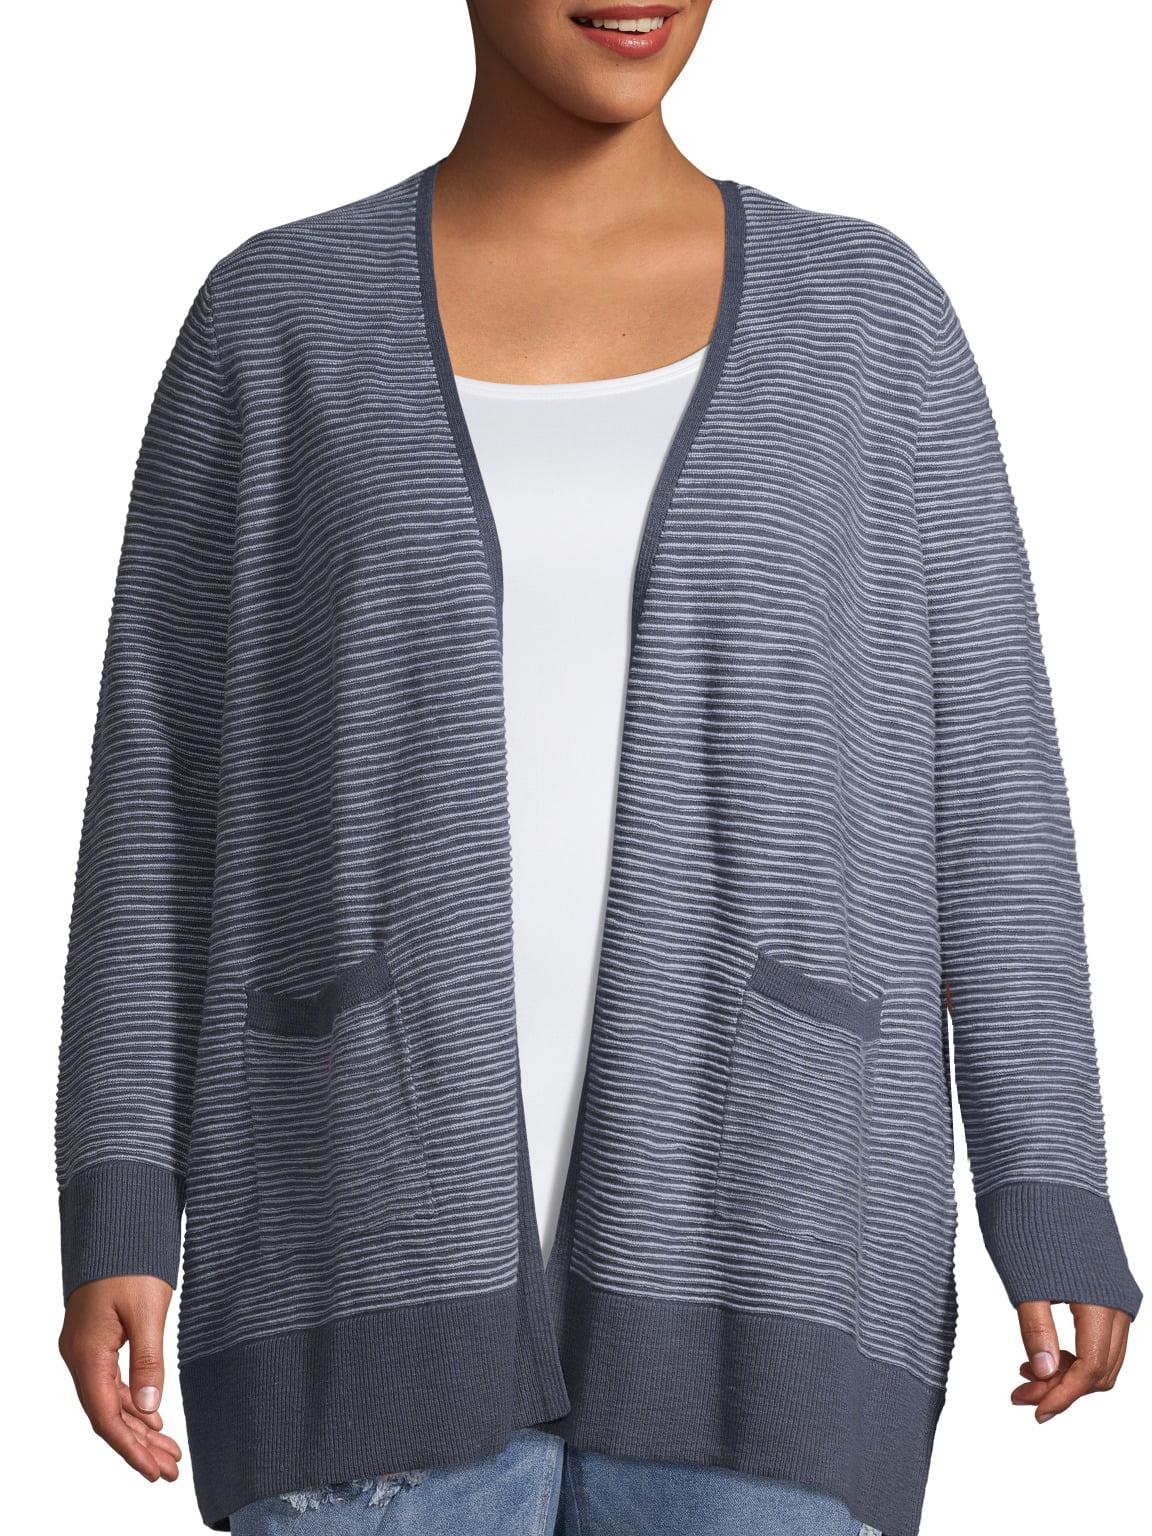 1X//2X//3X New Black Lace Long Swing Cut Jacket Cardigan Duster  Top Sweater